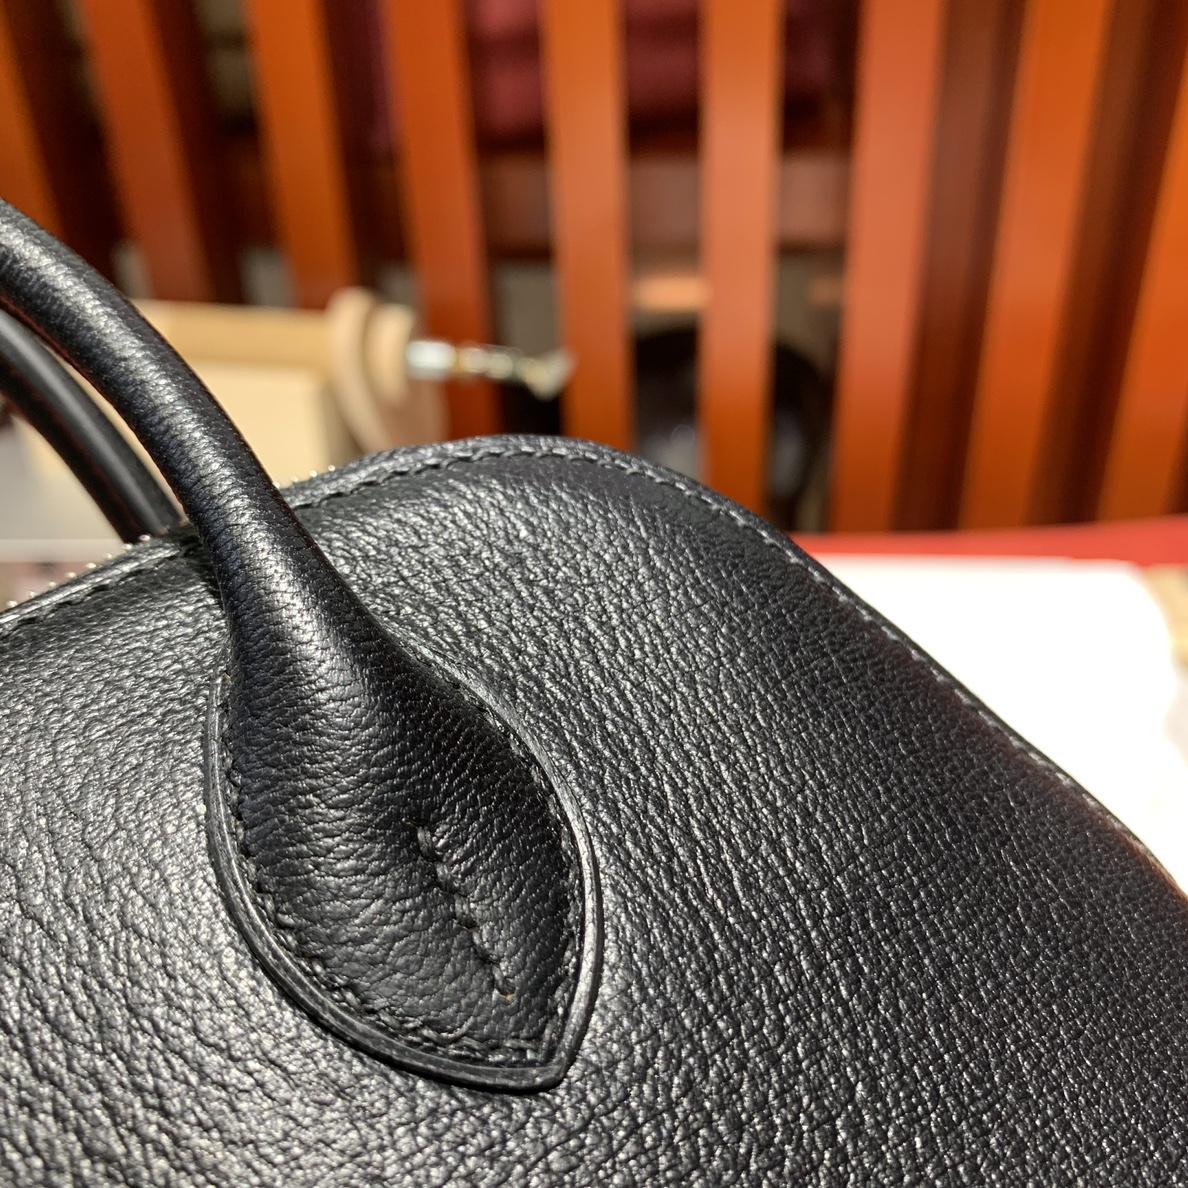 Hermes Mini Bolide18CM 爱马仕黑色进口山羊皮迷你保龄球包 银扣